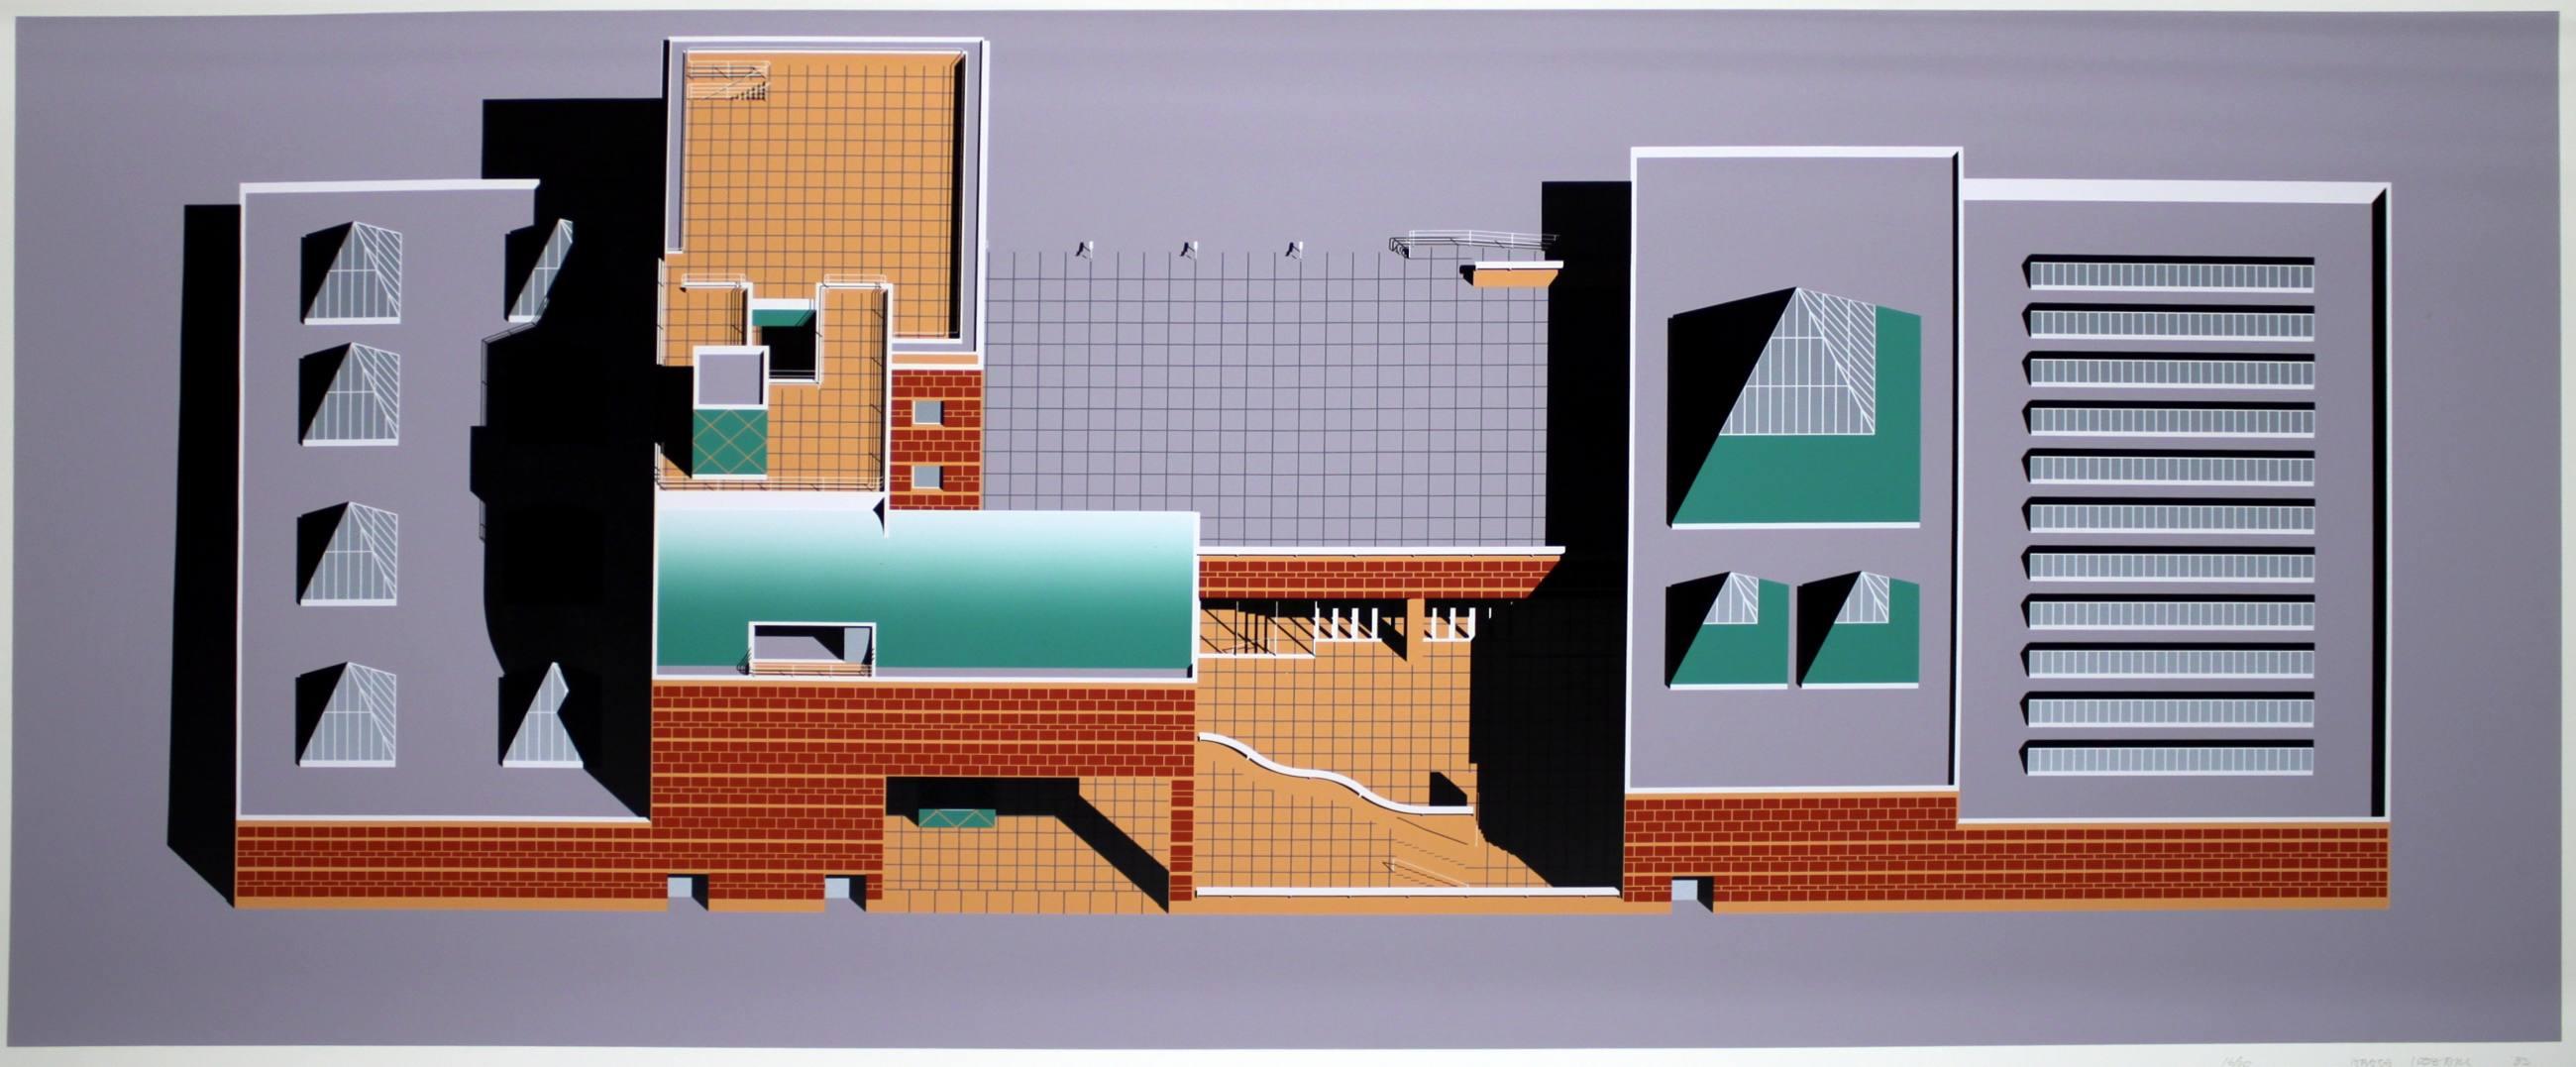 "Arata Isozaki, ""Overall axonometric (day),"" 1983"